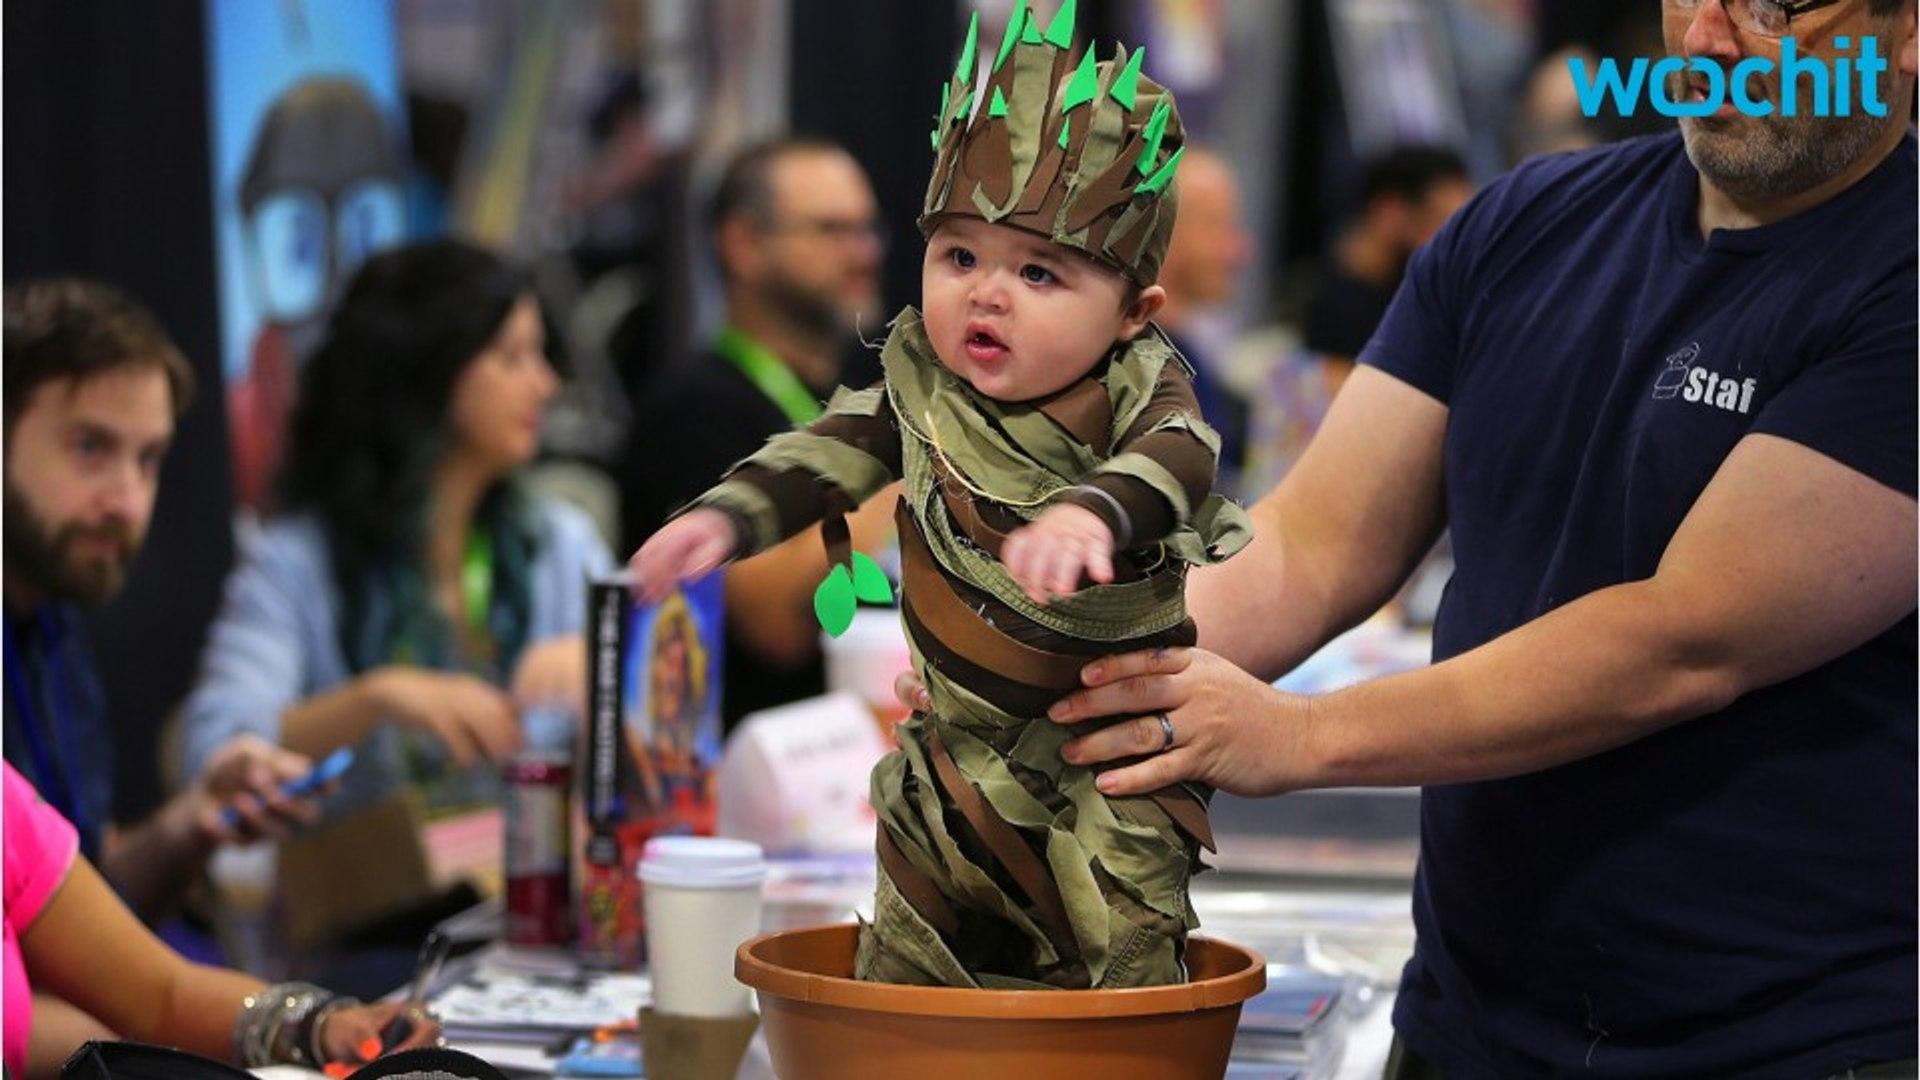 James Gunn Shares Adorable Baby Groot Cosplay